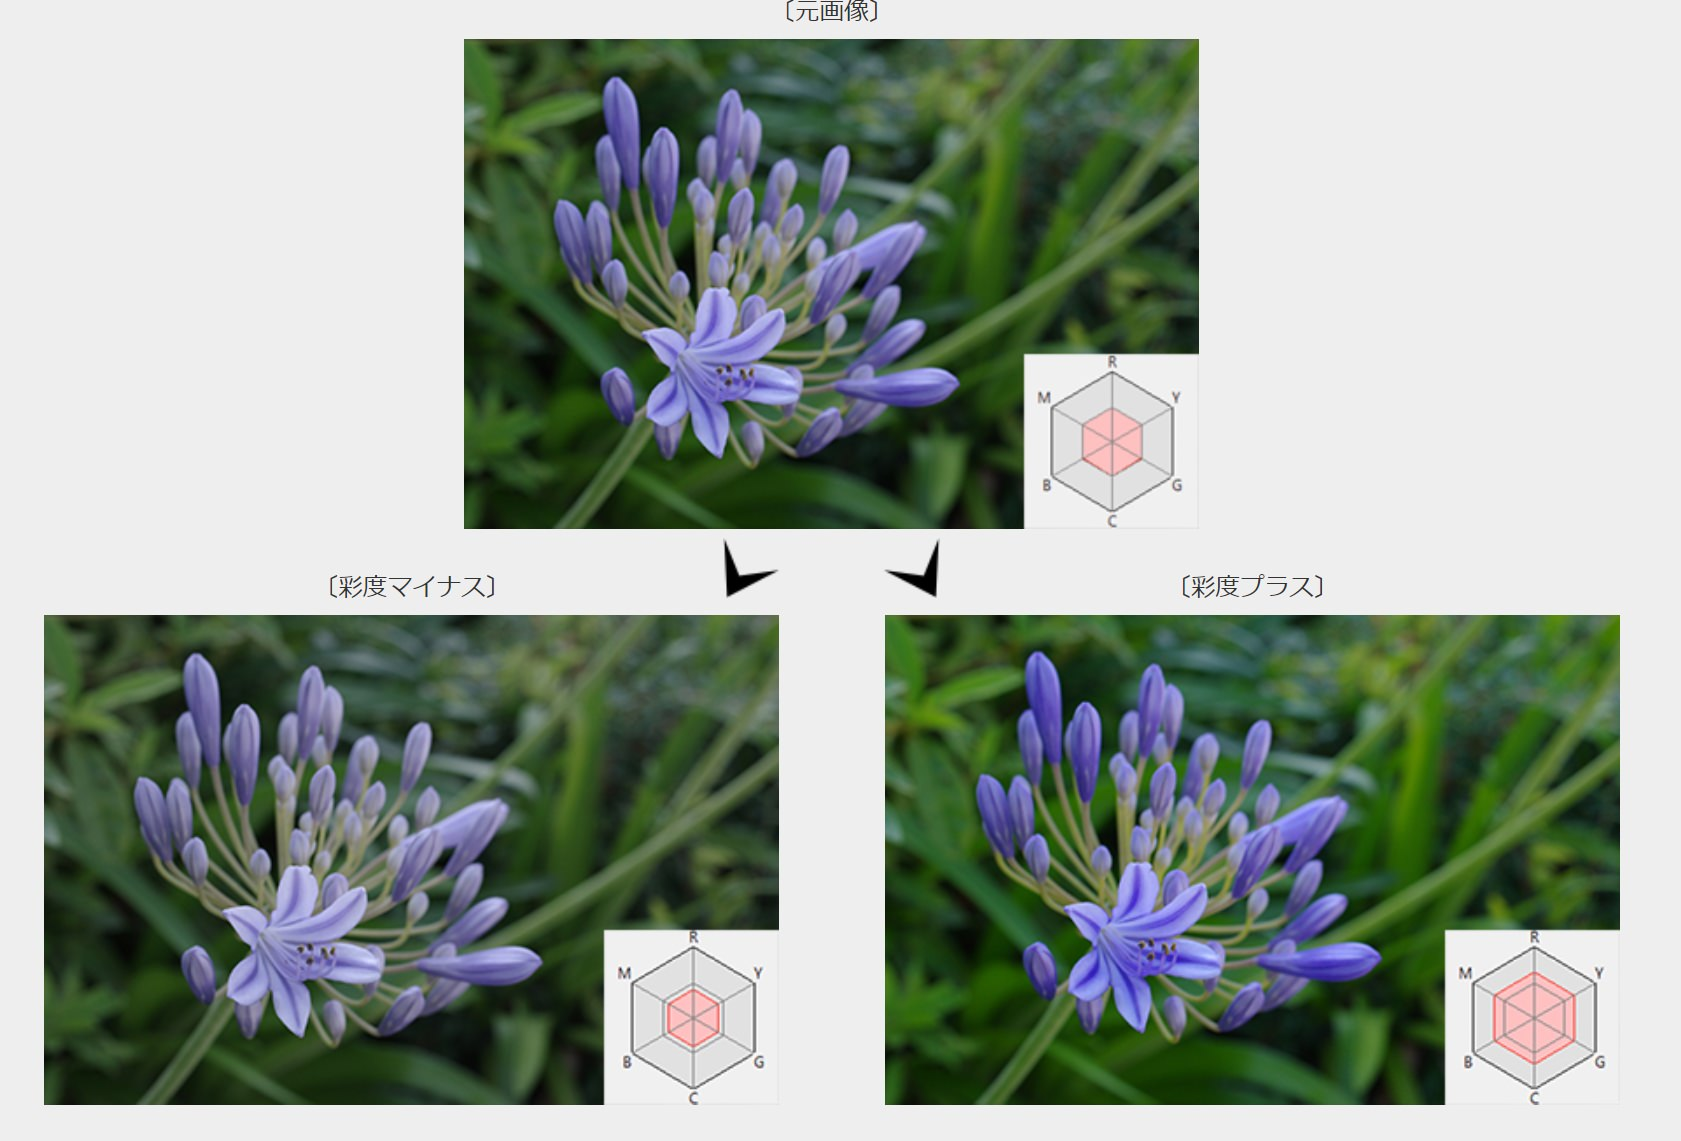 pentax公式の彩度の画像